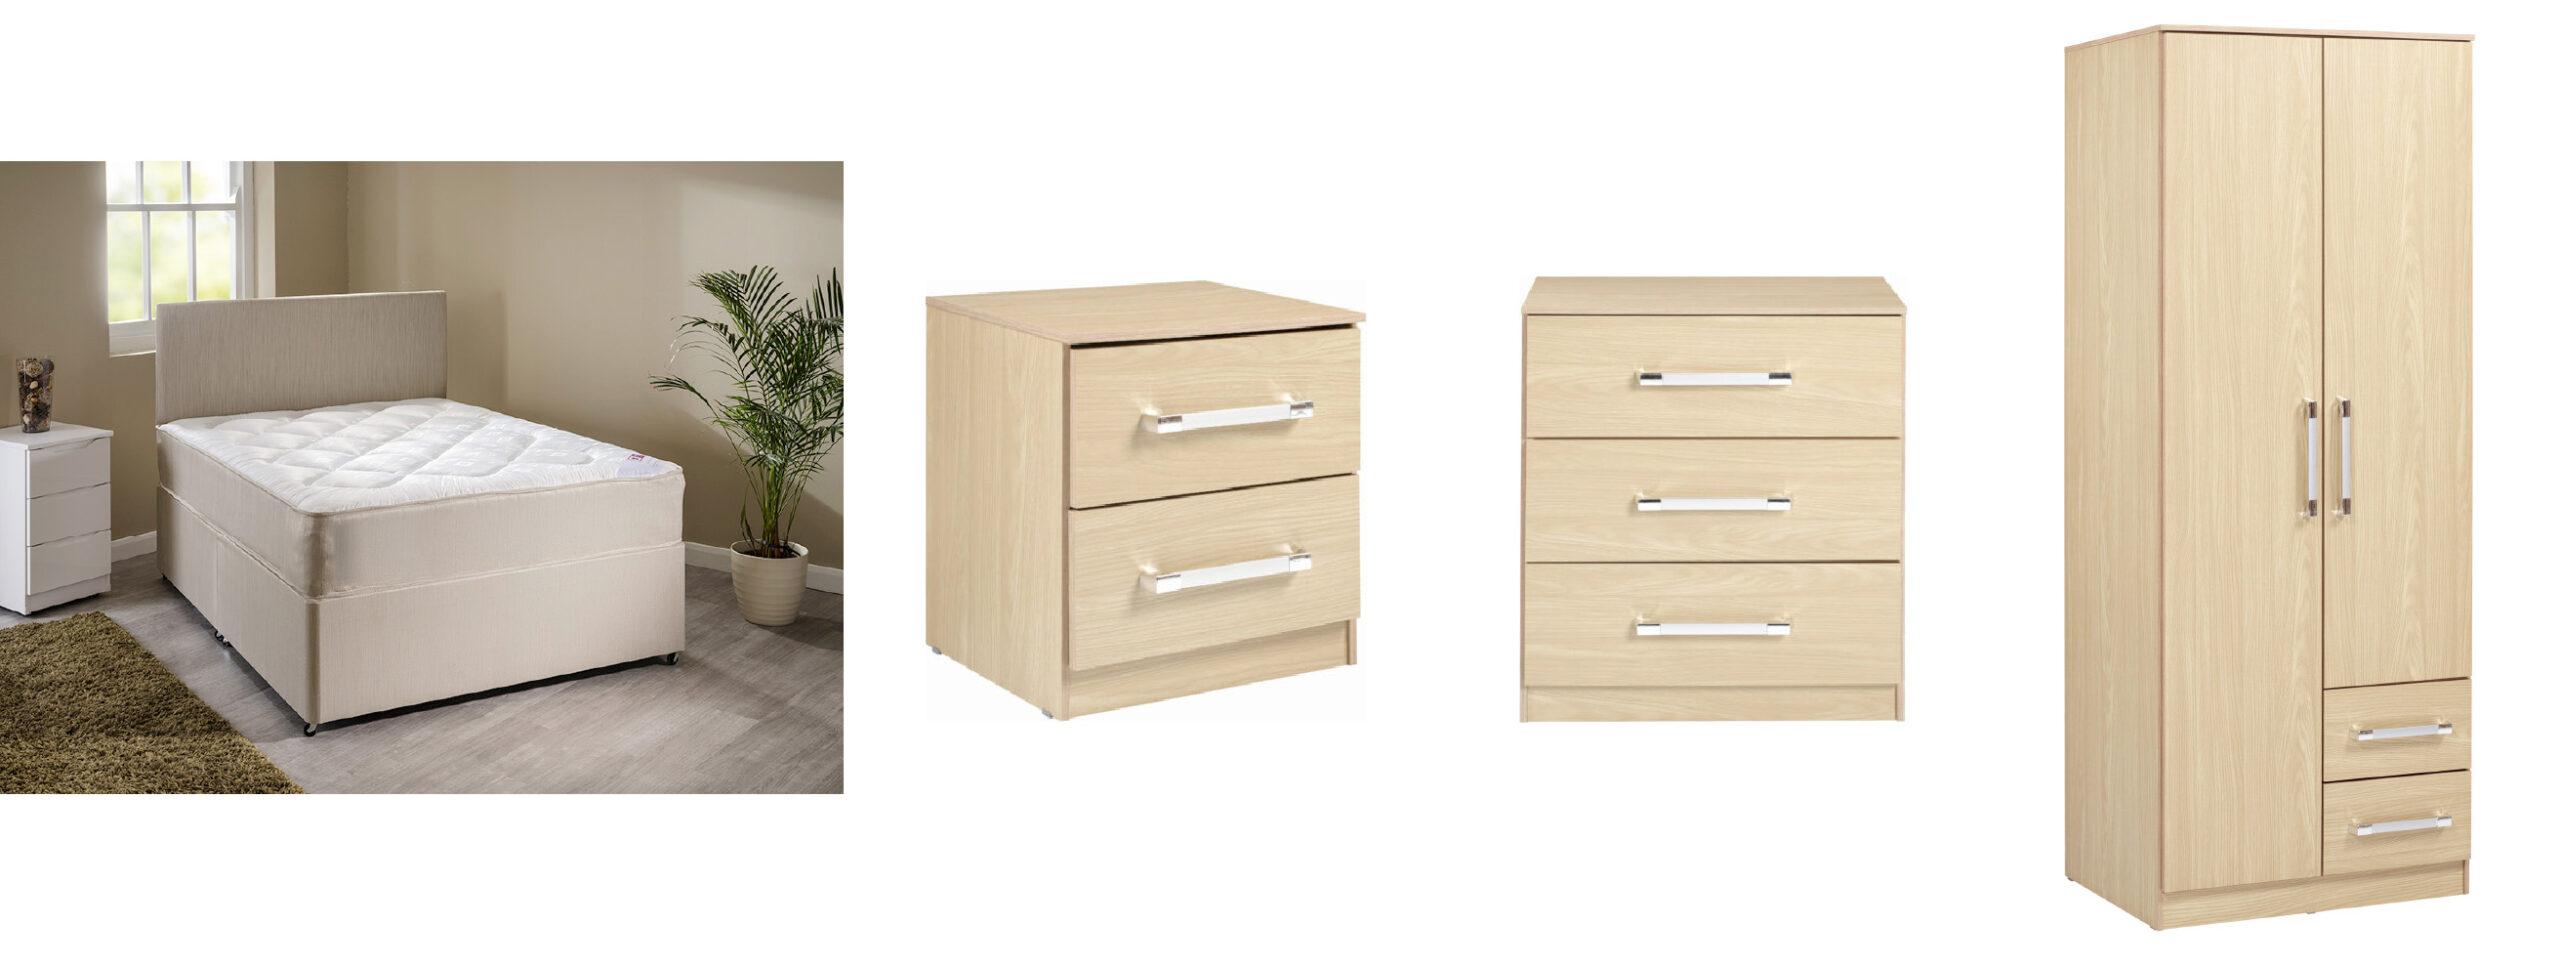 Landlord furniture package 2